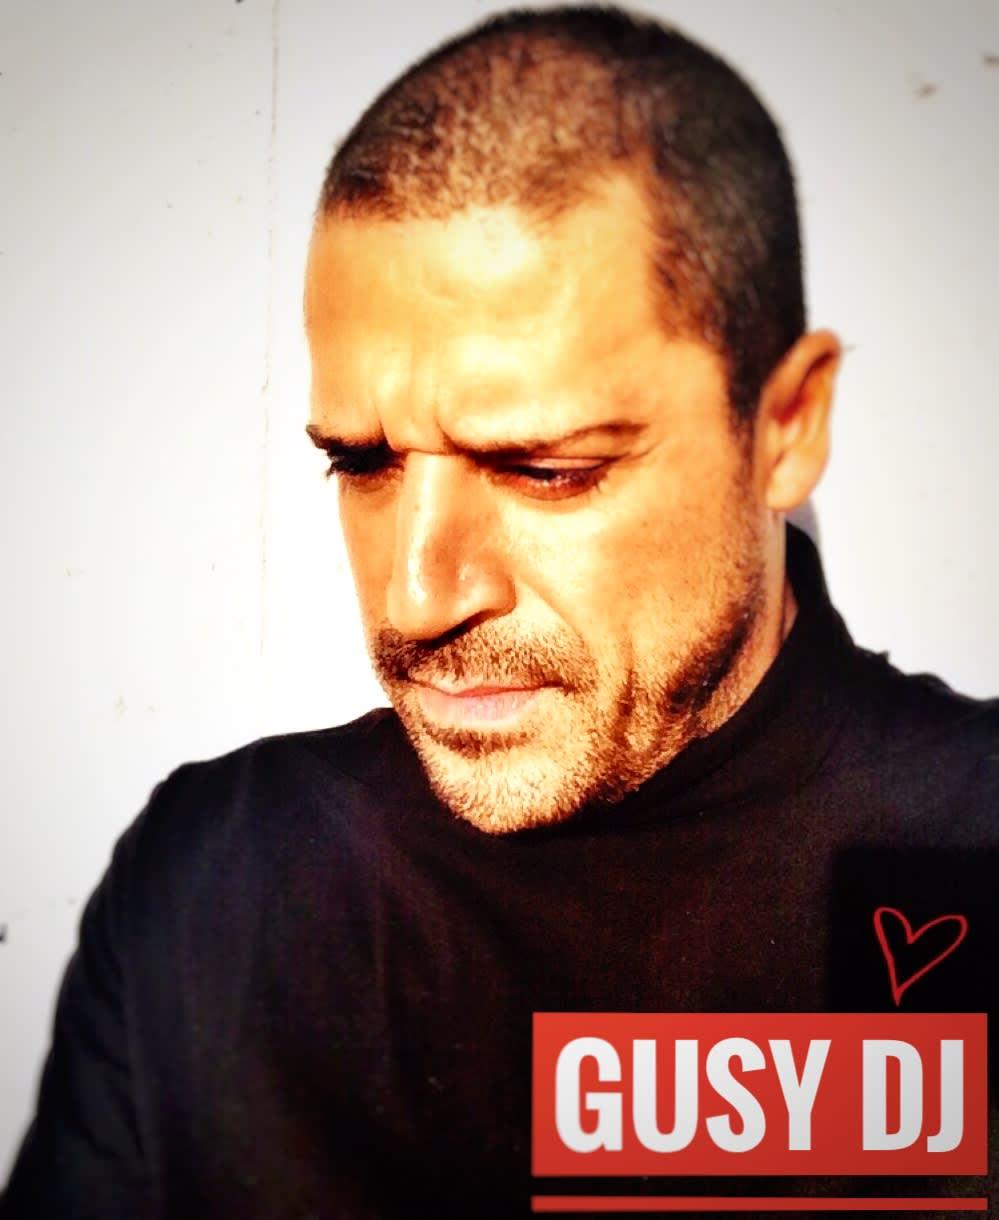 Gusy DJ